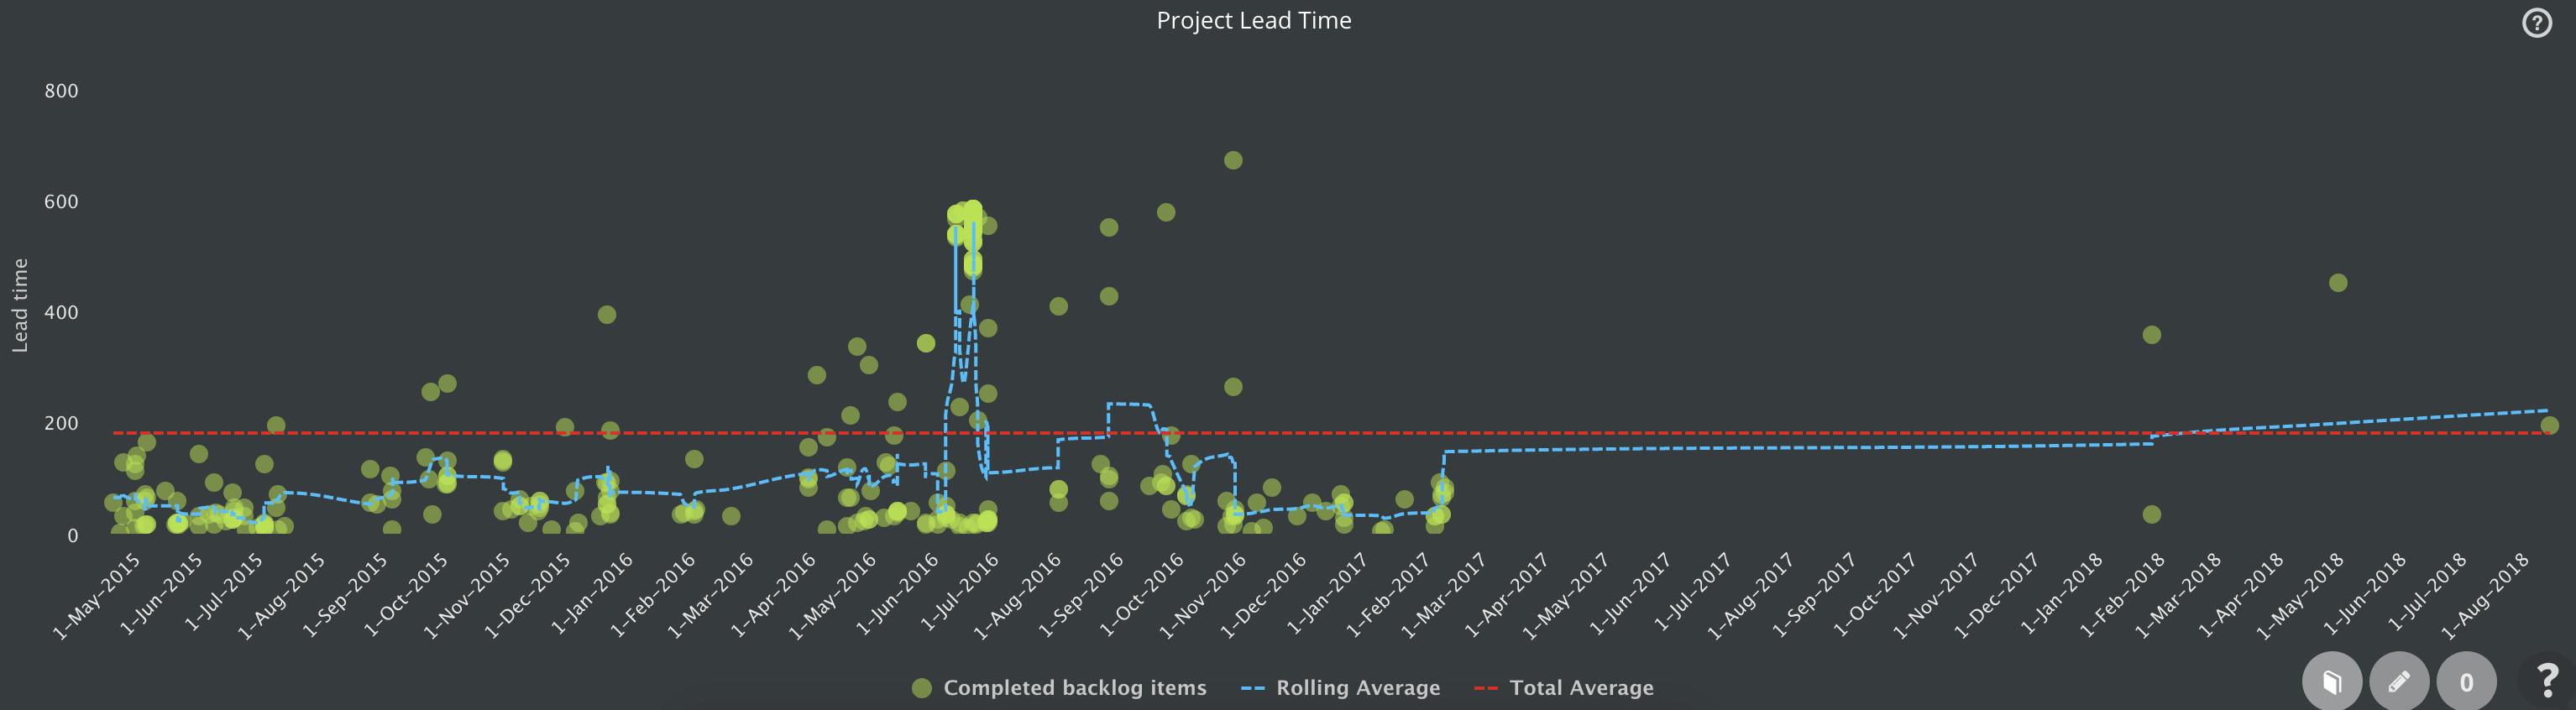 project lead time control chart jira